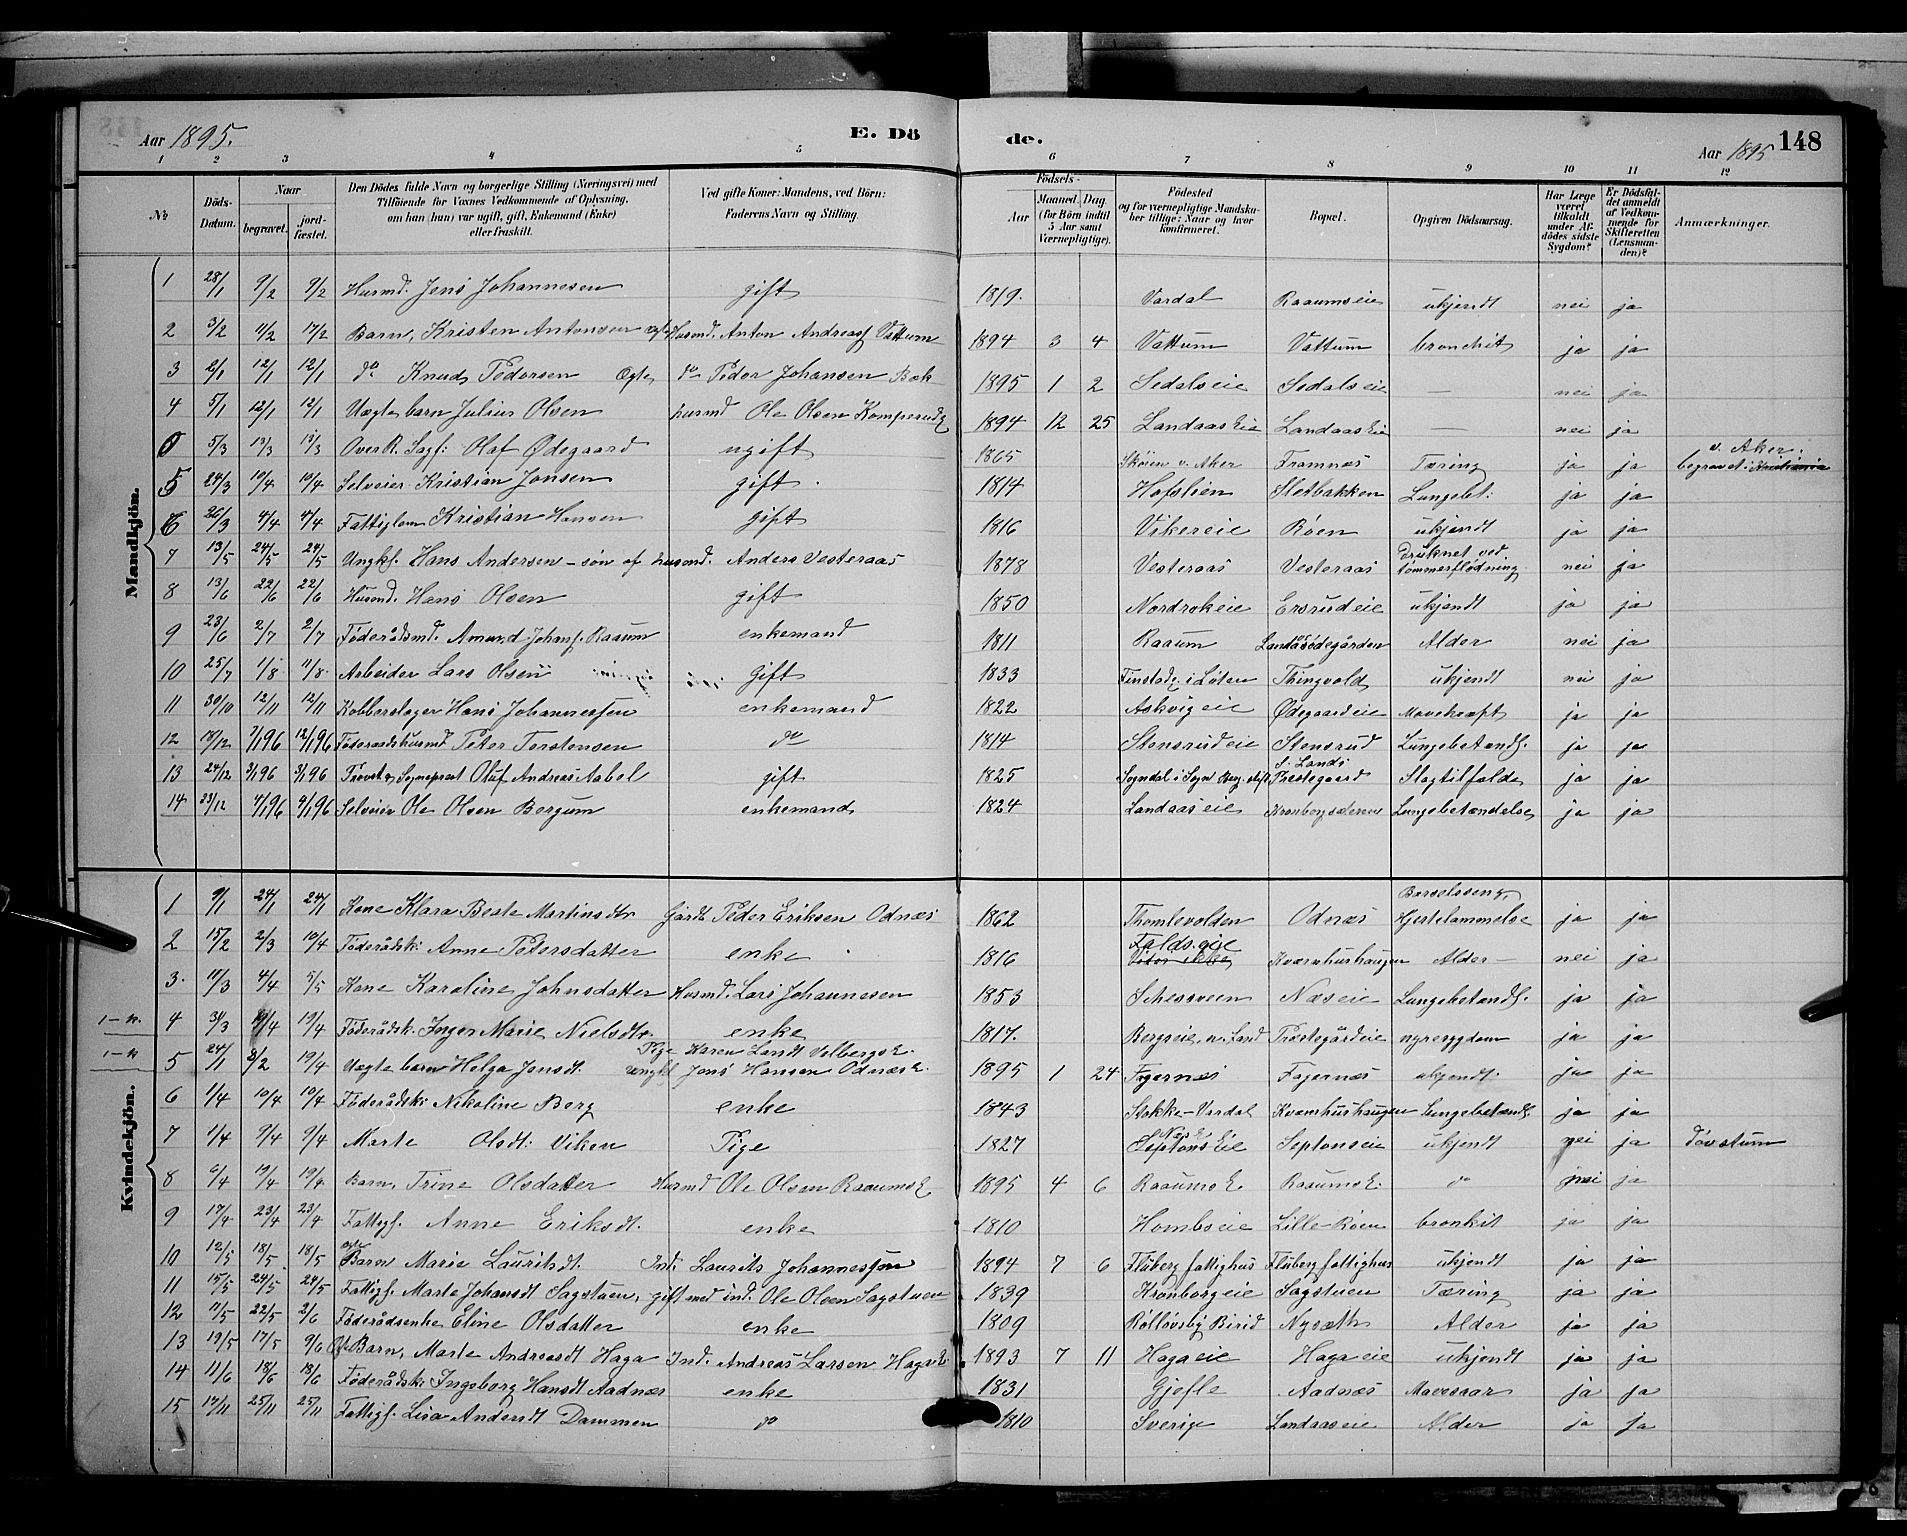 SAH, Søndre Land prestekontor, L/L0003: Klokkerbok nr. 3, 1884-1902, s. 148